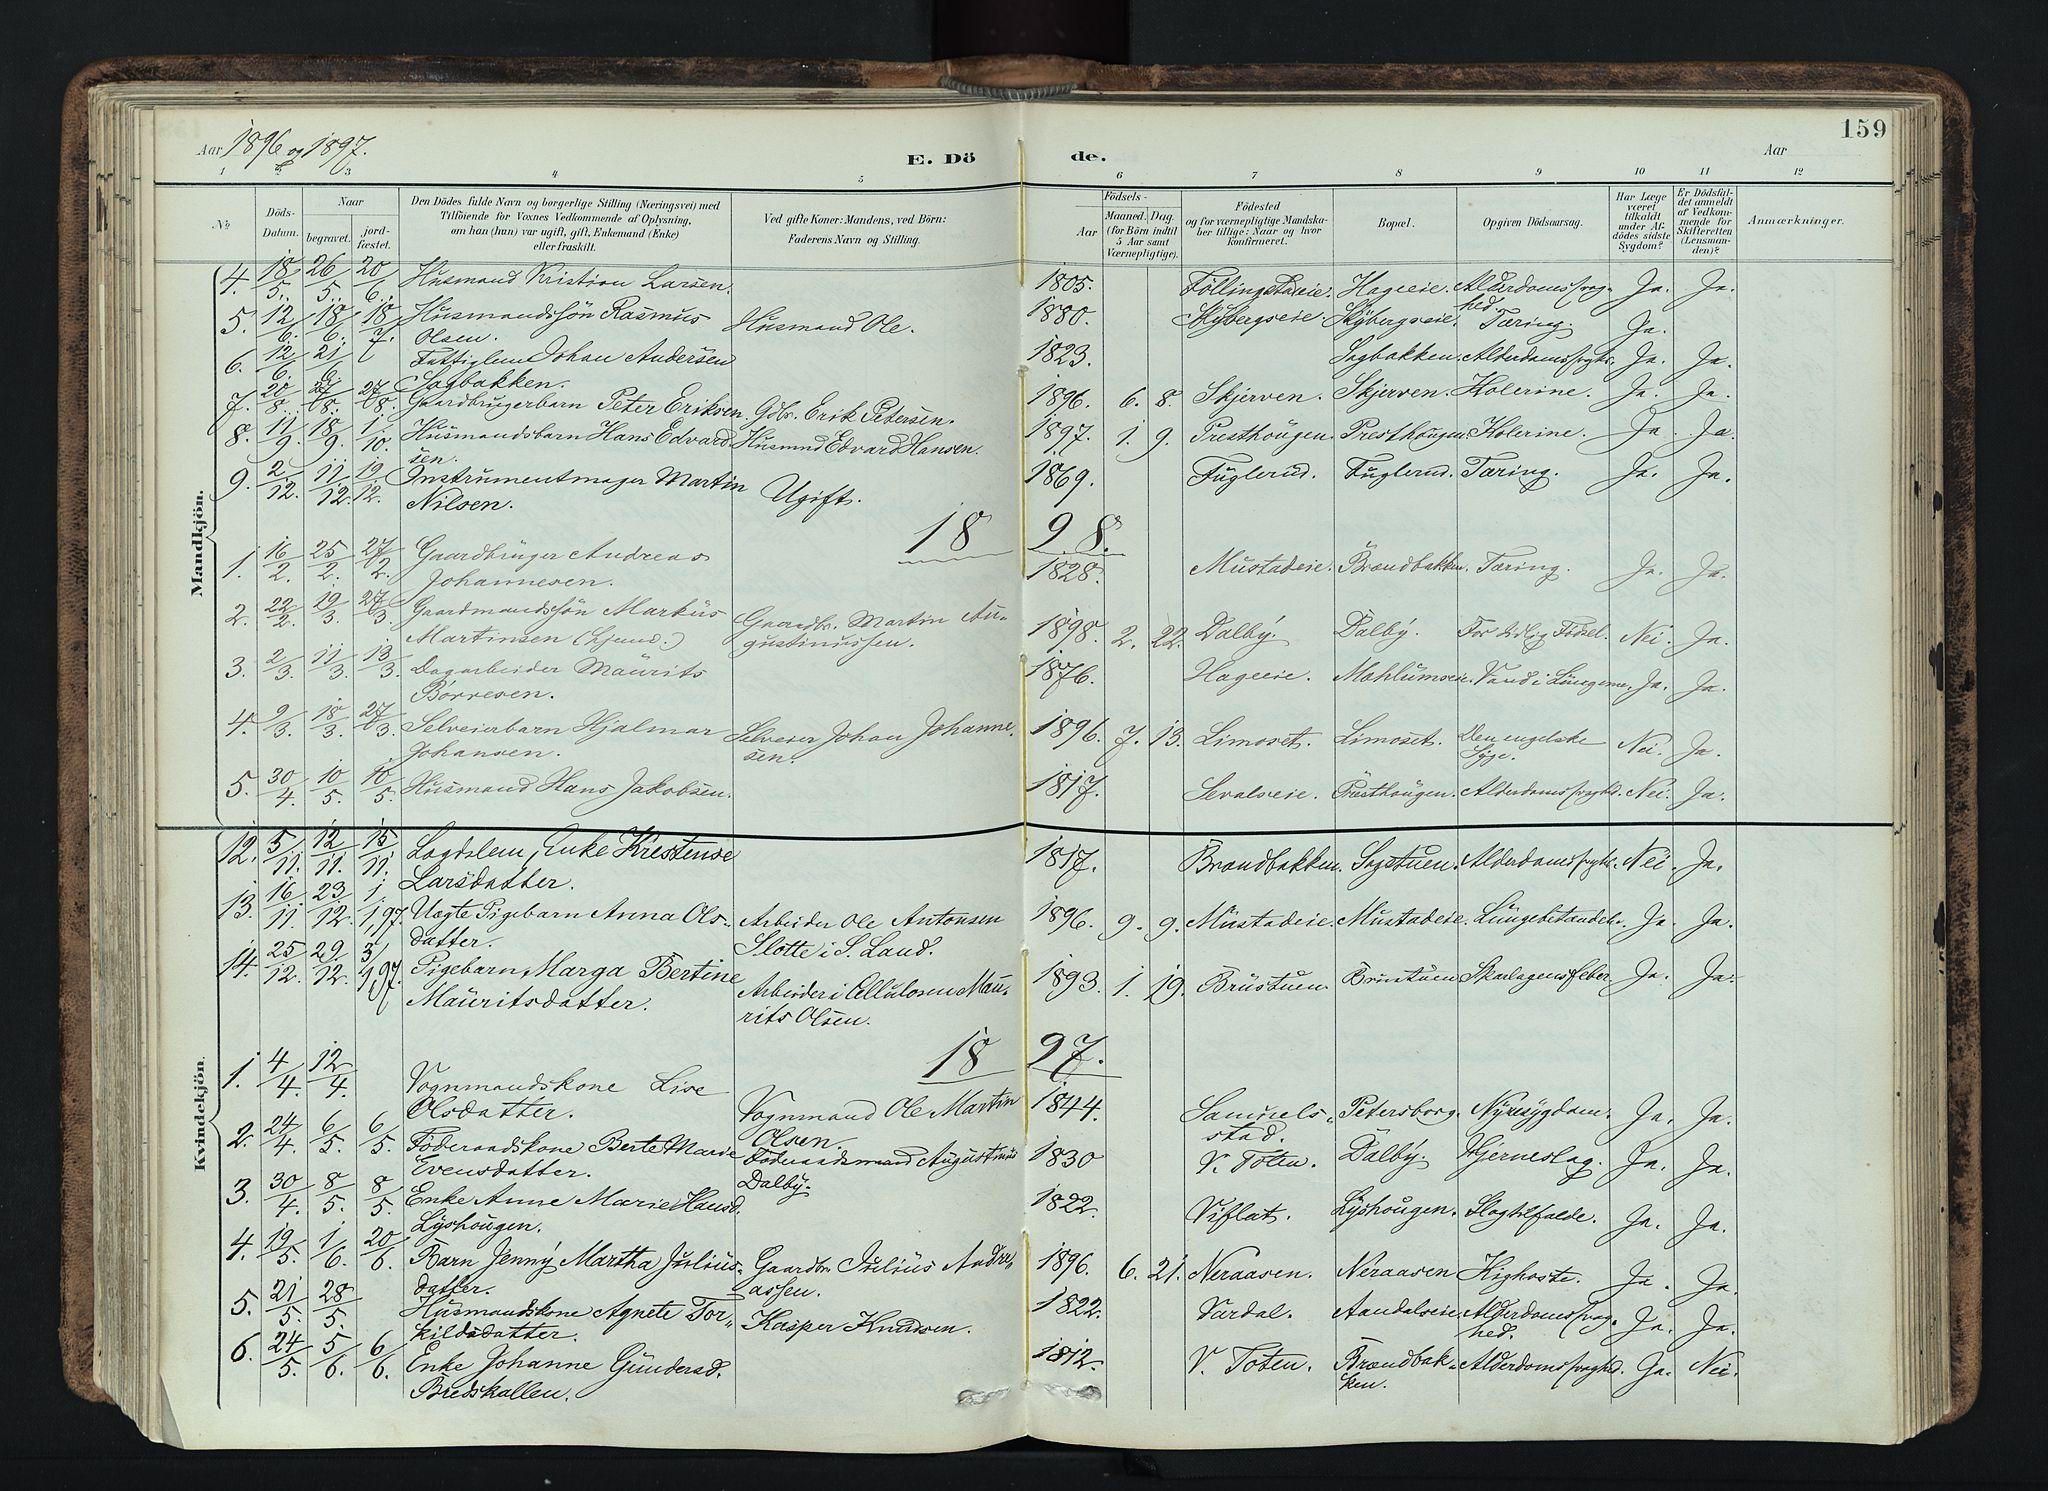 SAH, Vardal prestekontor, H/Ha/Haa/L0019: Ministerialbok nr. 19, 1893-1907, s. 159